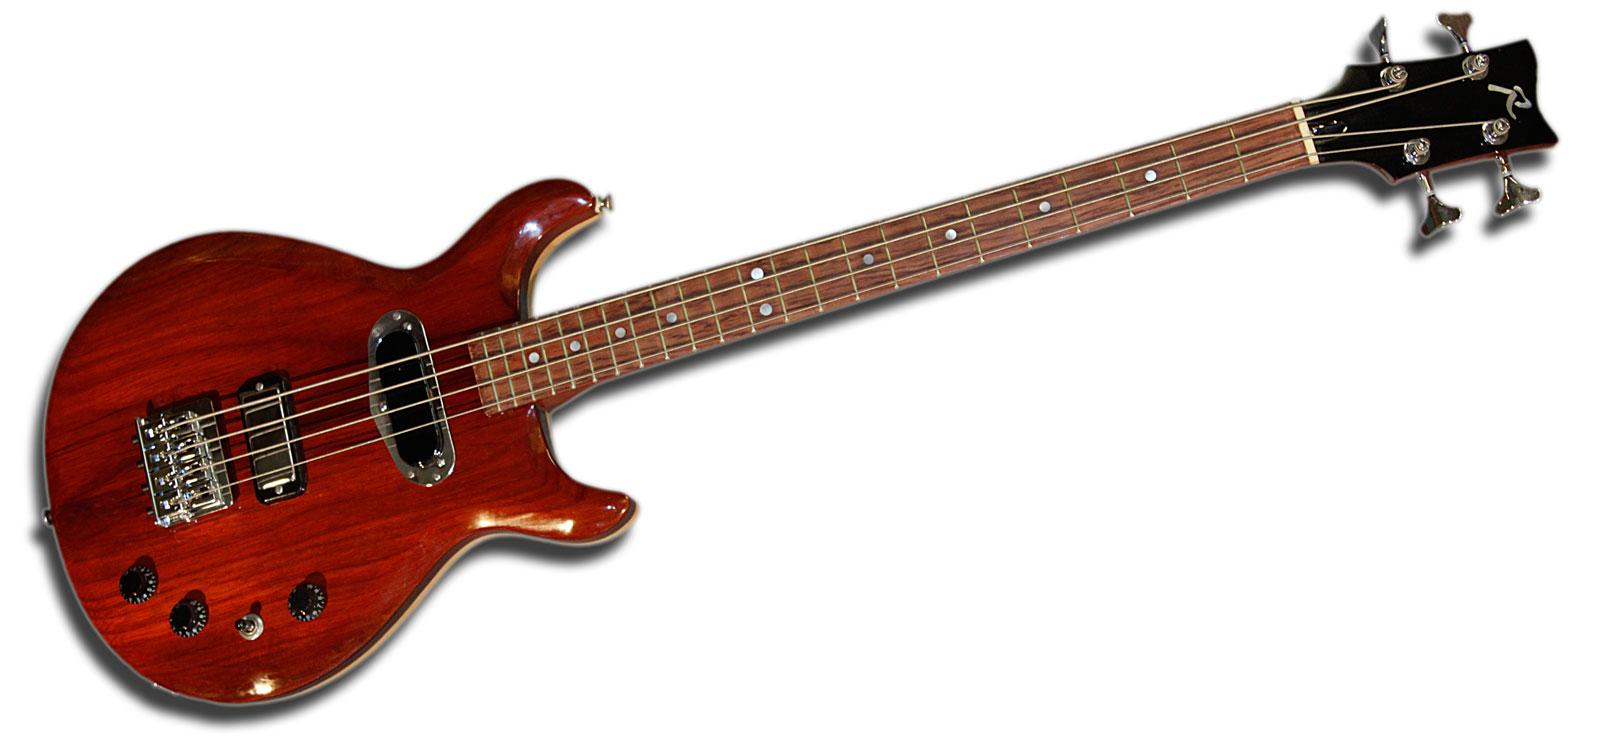 rock factory bass guitars rivertone bass paduak maple. Black Bedroom Furniture Sets. Home Design Ideas